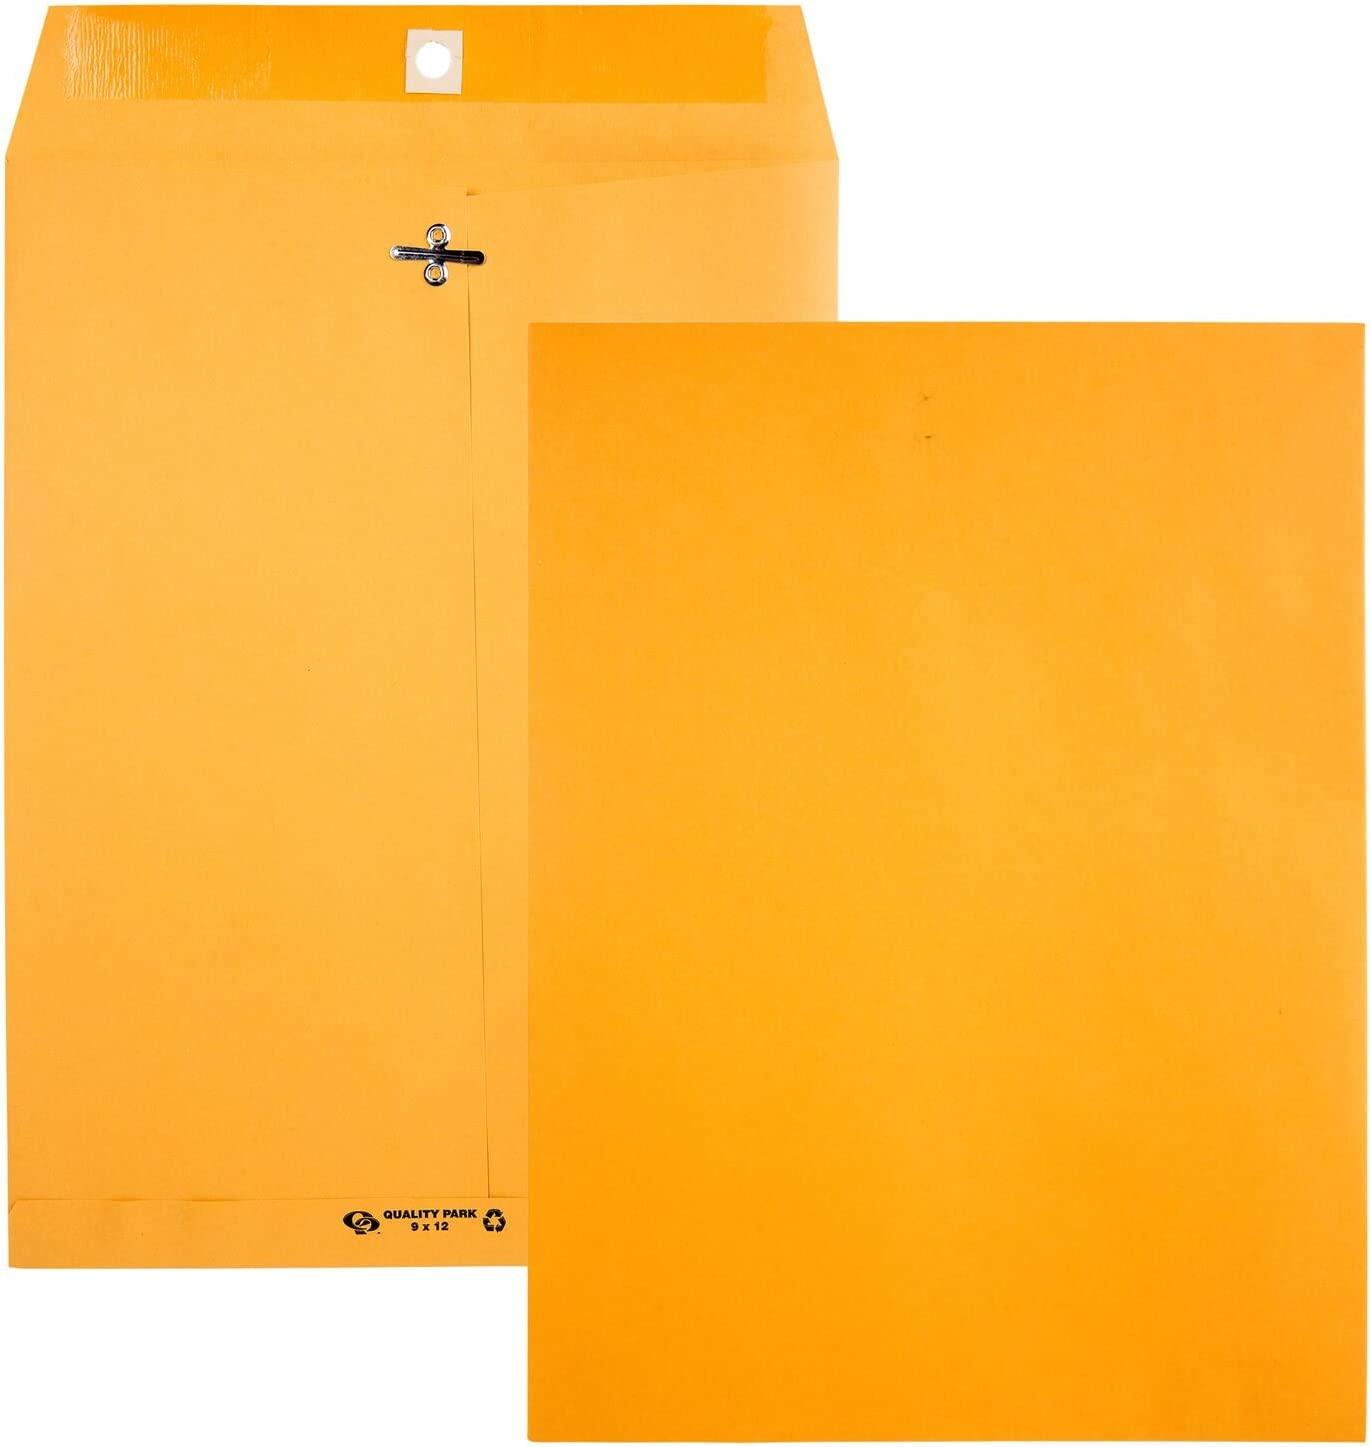 Max 79% OFF Quality Park QUA38190 Recycled Clasp Bro 100 Box Envelopes National uniform free shipping